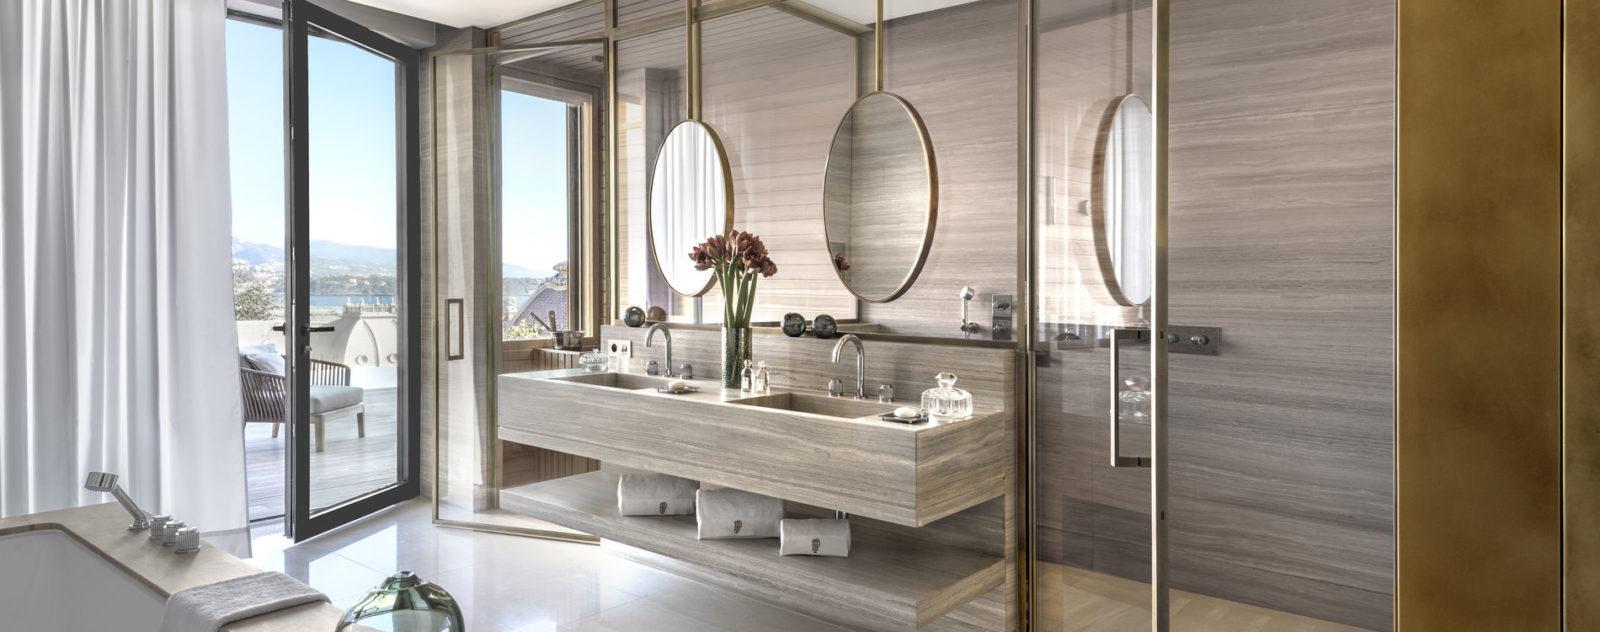 Hammam Sauna Hotel De Paris Bathroom Diamond Suite Montecarlo